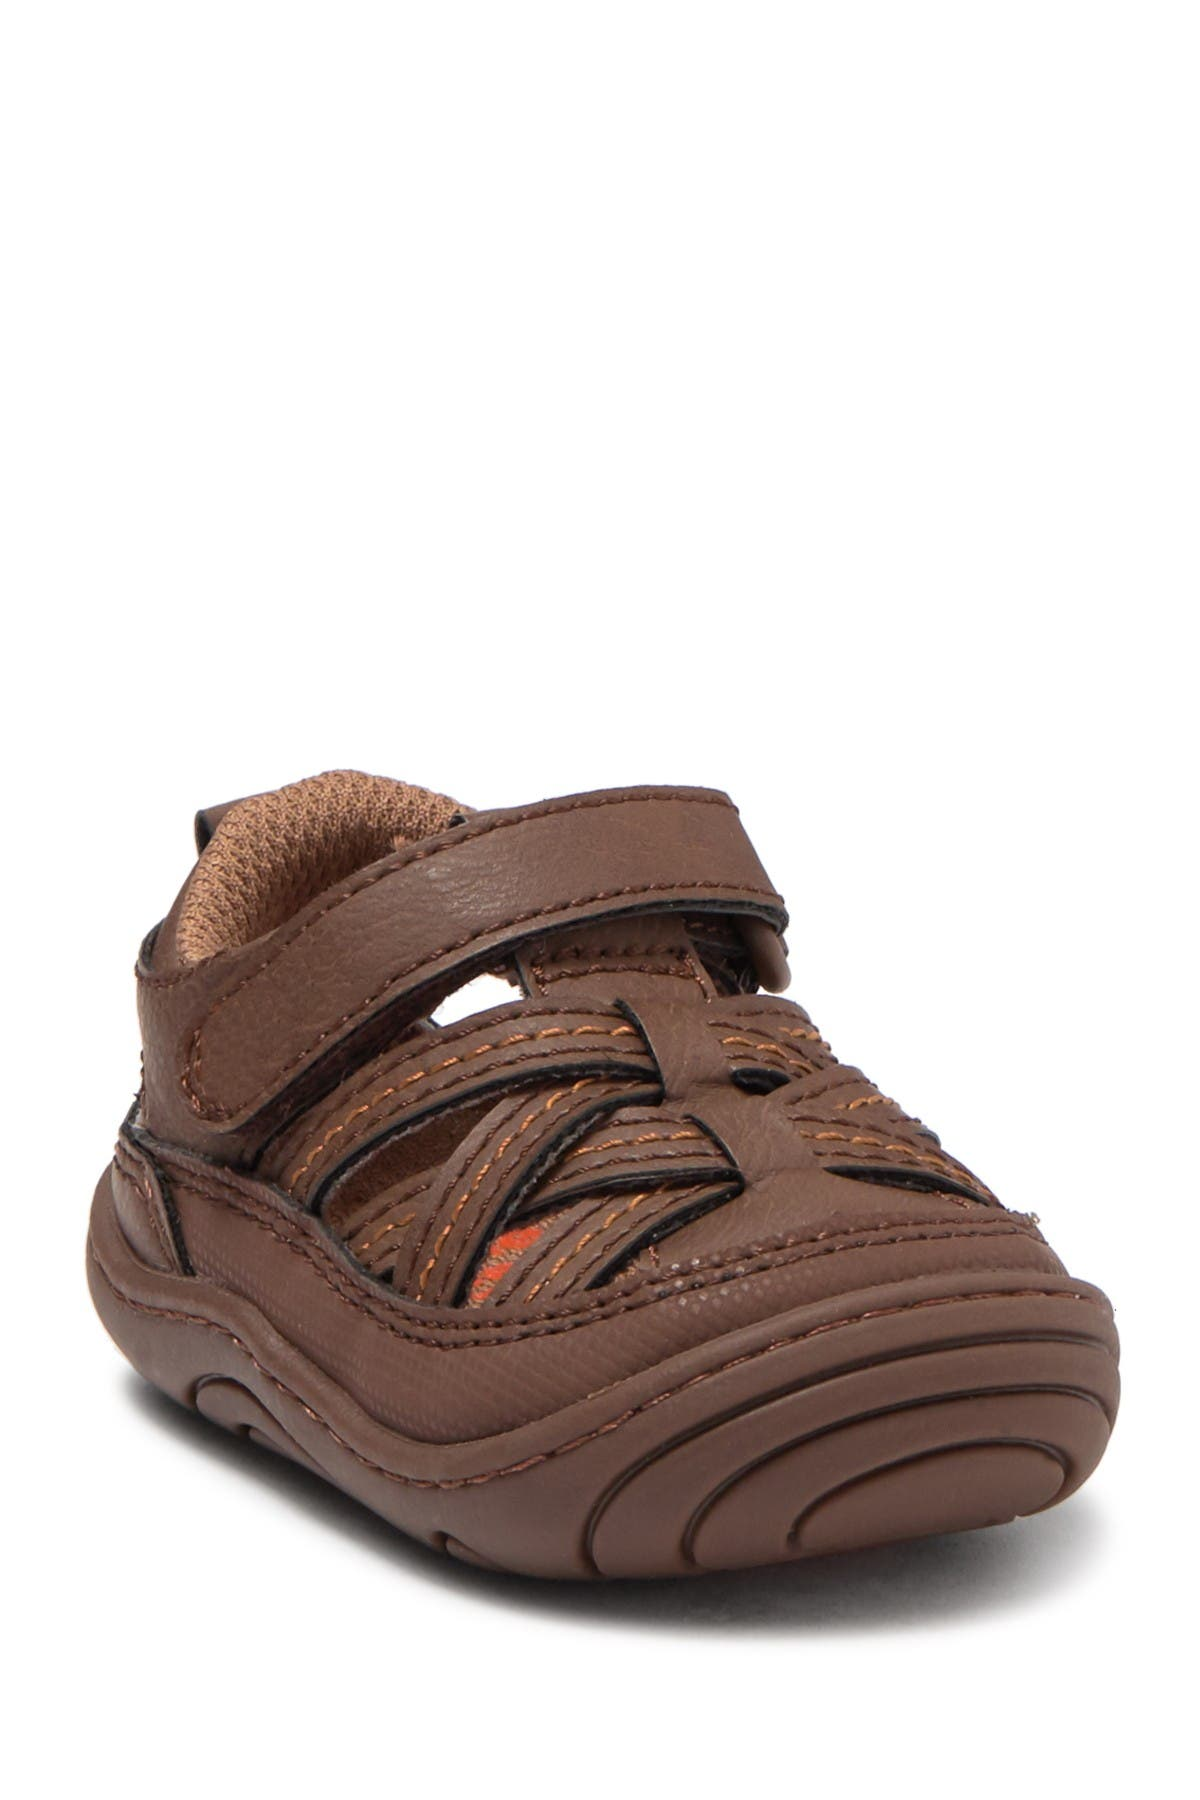 Image of Stride Rite Amos 2.0 Sandal